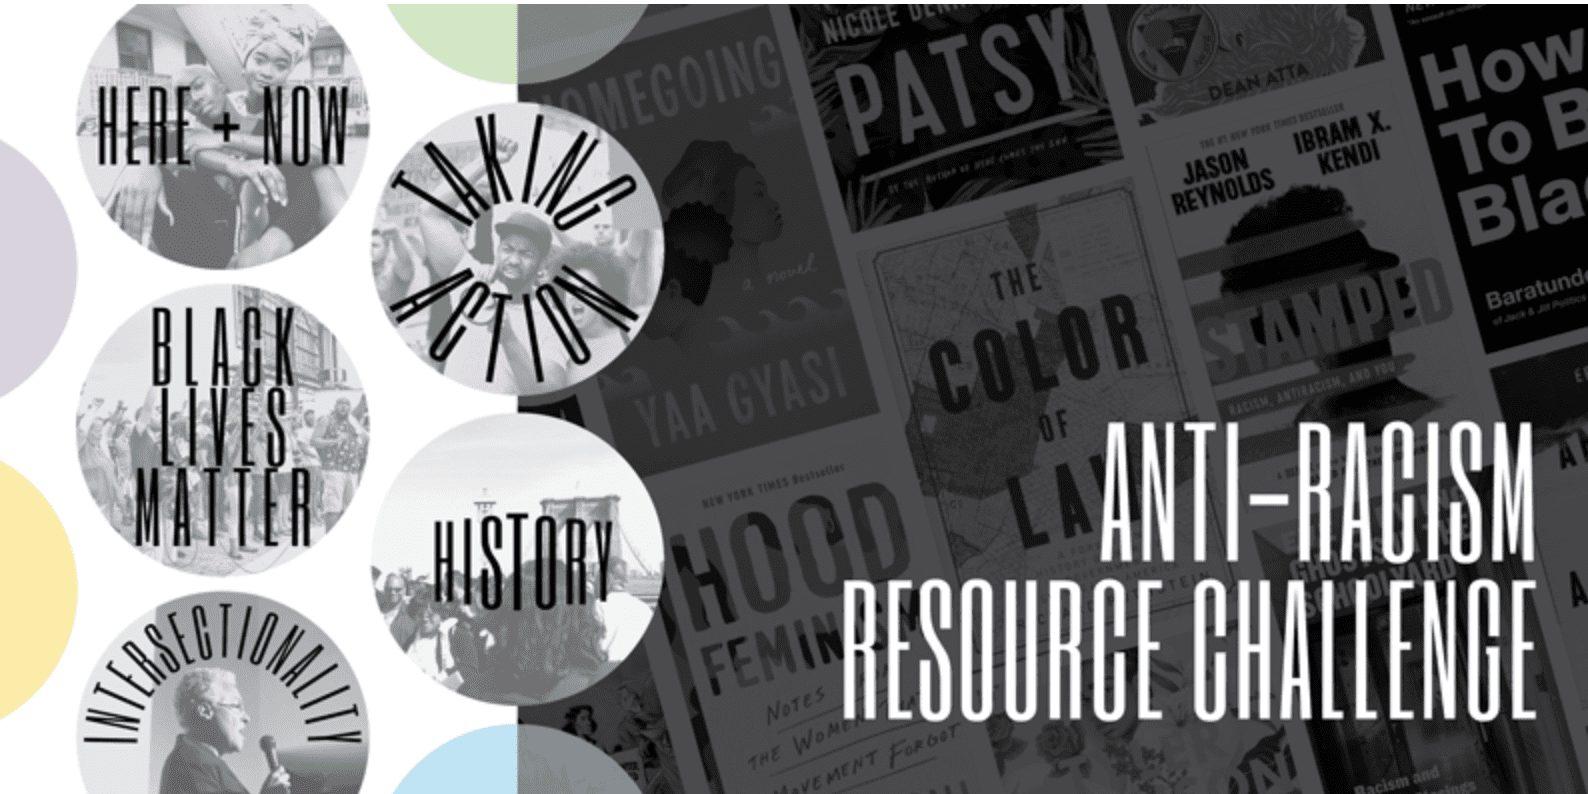 Anti-racism resource challenge